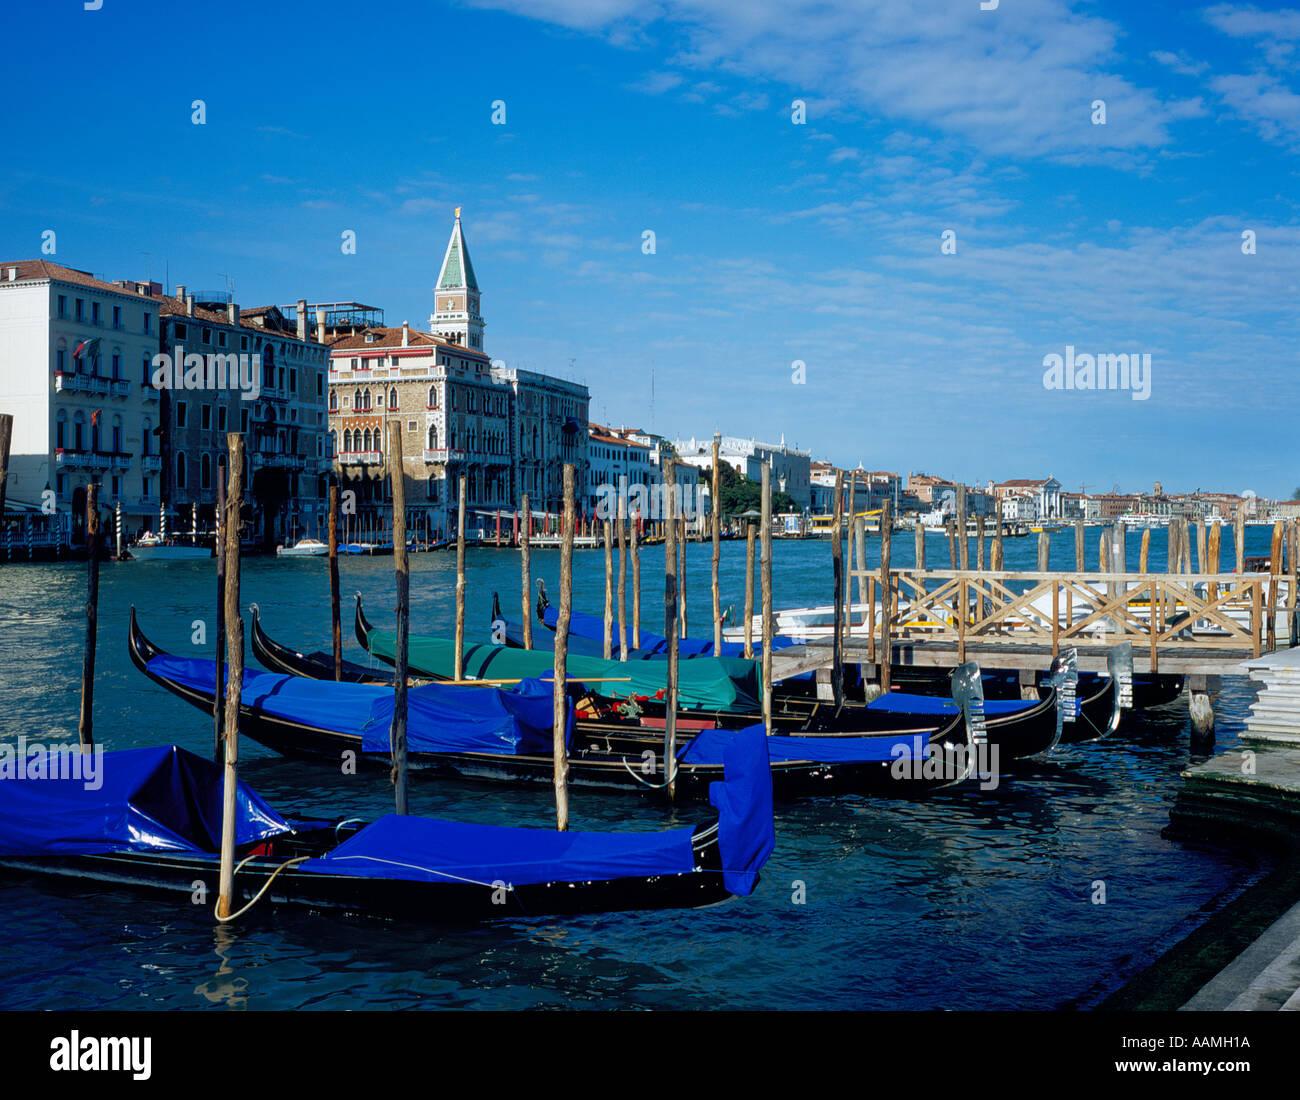 Gondolas on Canal Grande, Venice, UNESCO World Heritage Site, Italy, Europe. Photo by Willy Matheisl - Stock Image